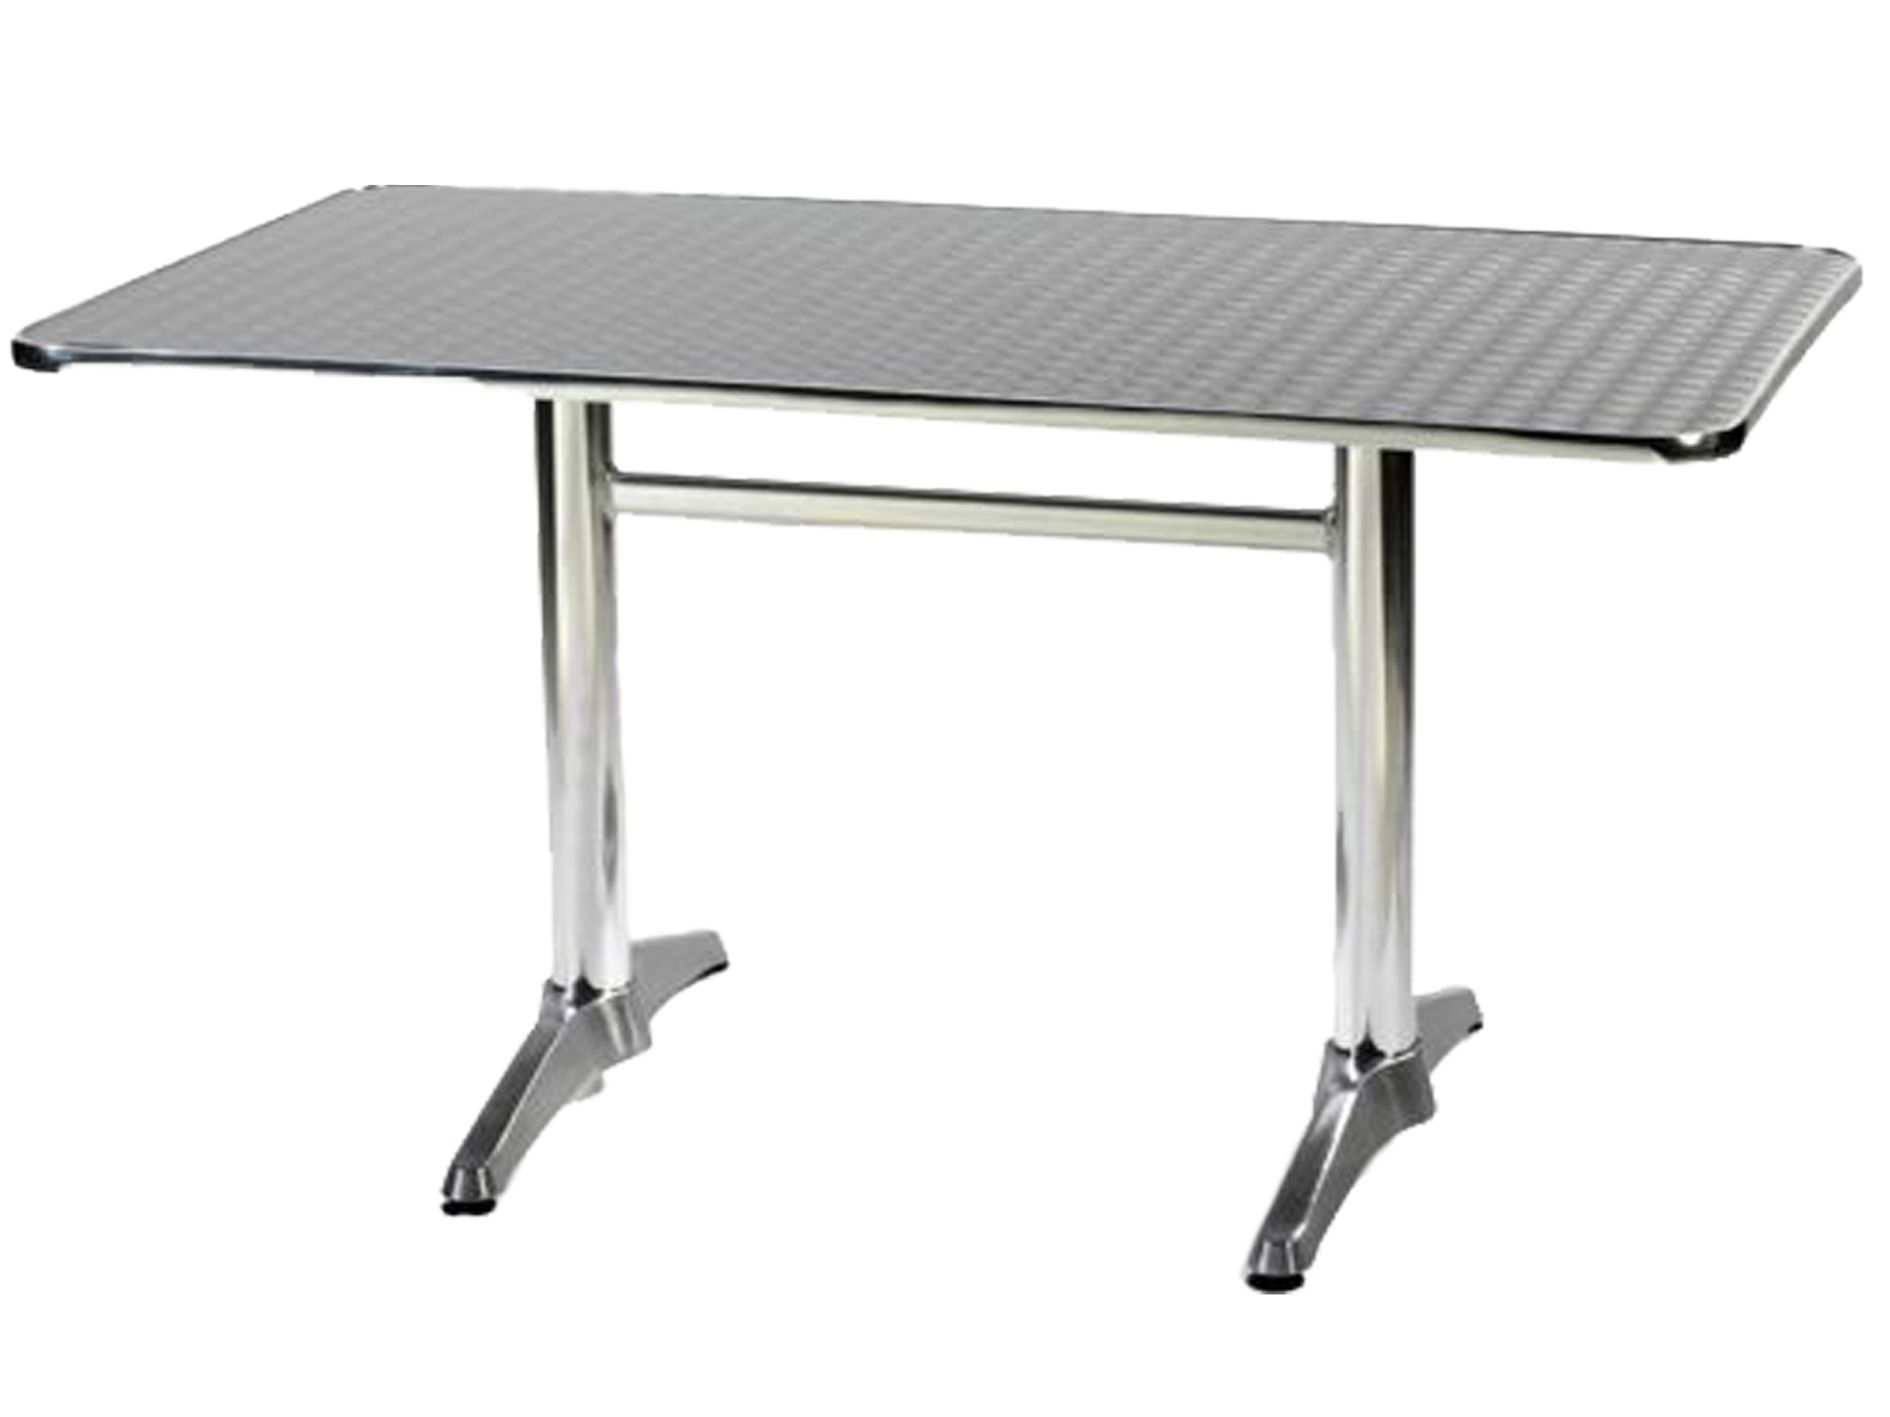 ALUMINIUM 60 X 120 CAFE TABLE 6 SEATERDIMENSIONS:HEIGHT:WEIGHT: